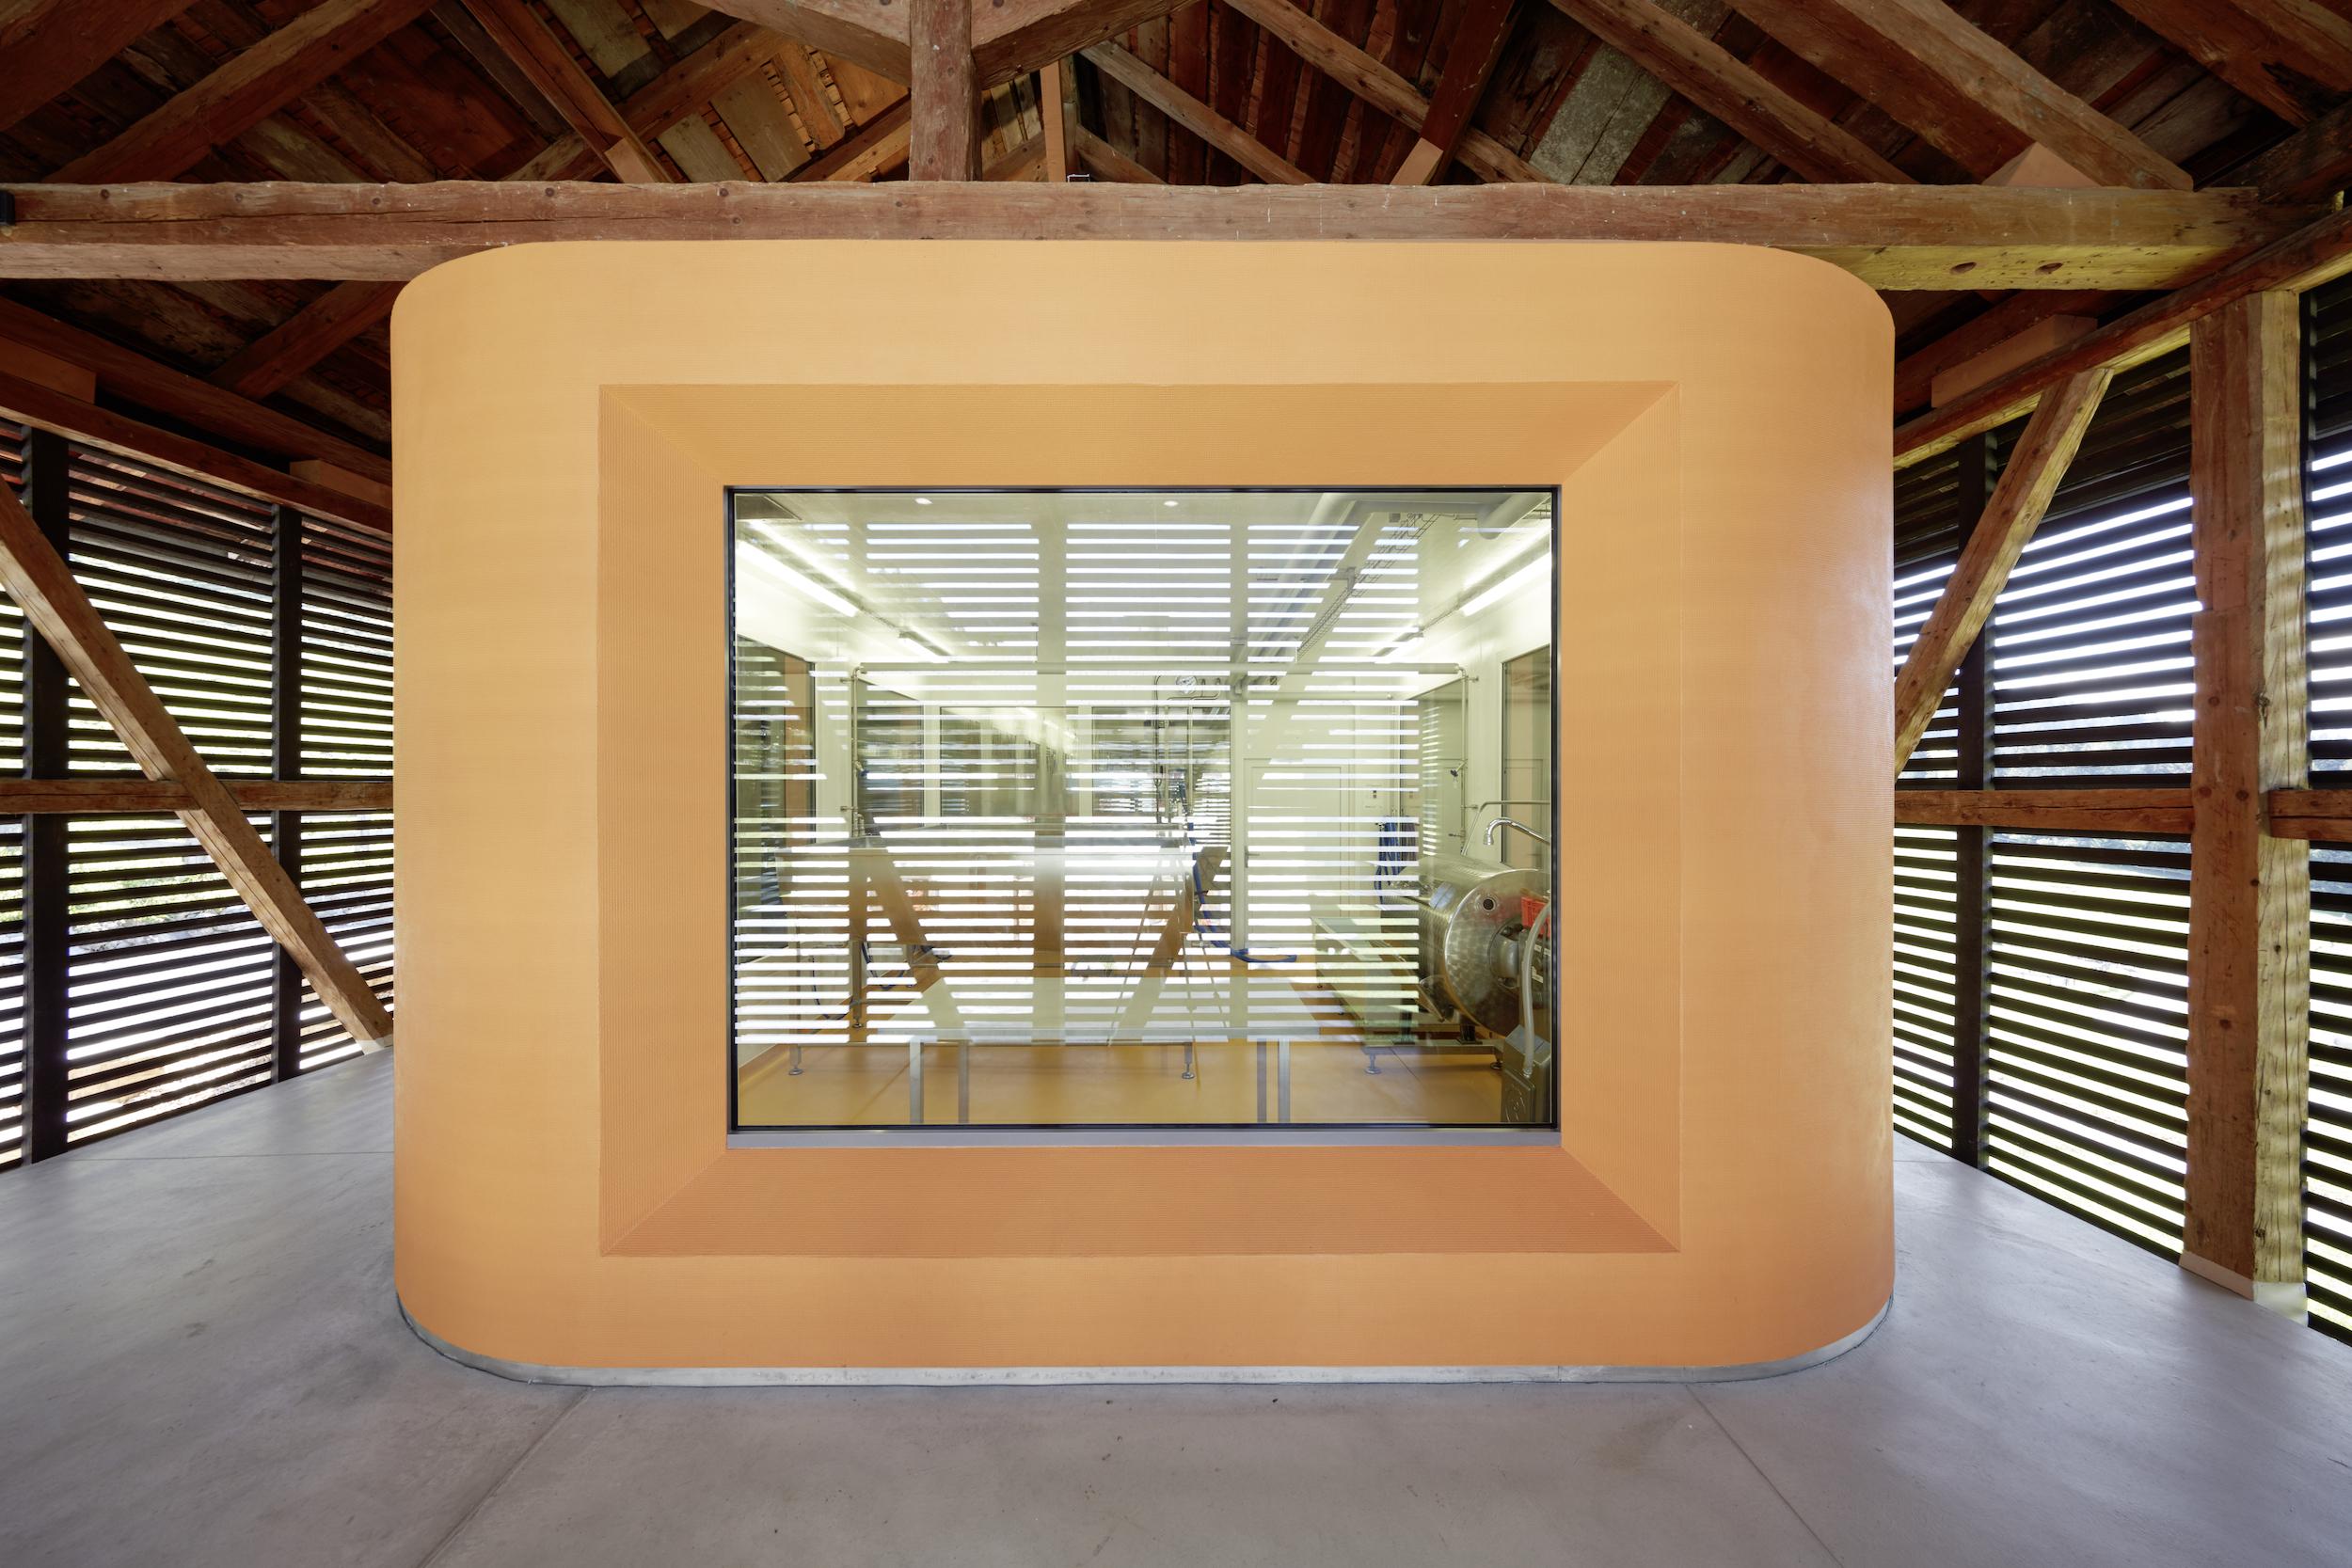 christen-architekturbuero-chur-alpkaeserei-parpan-foto5